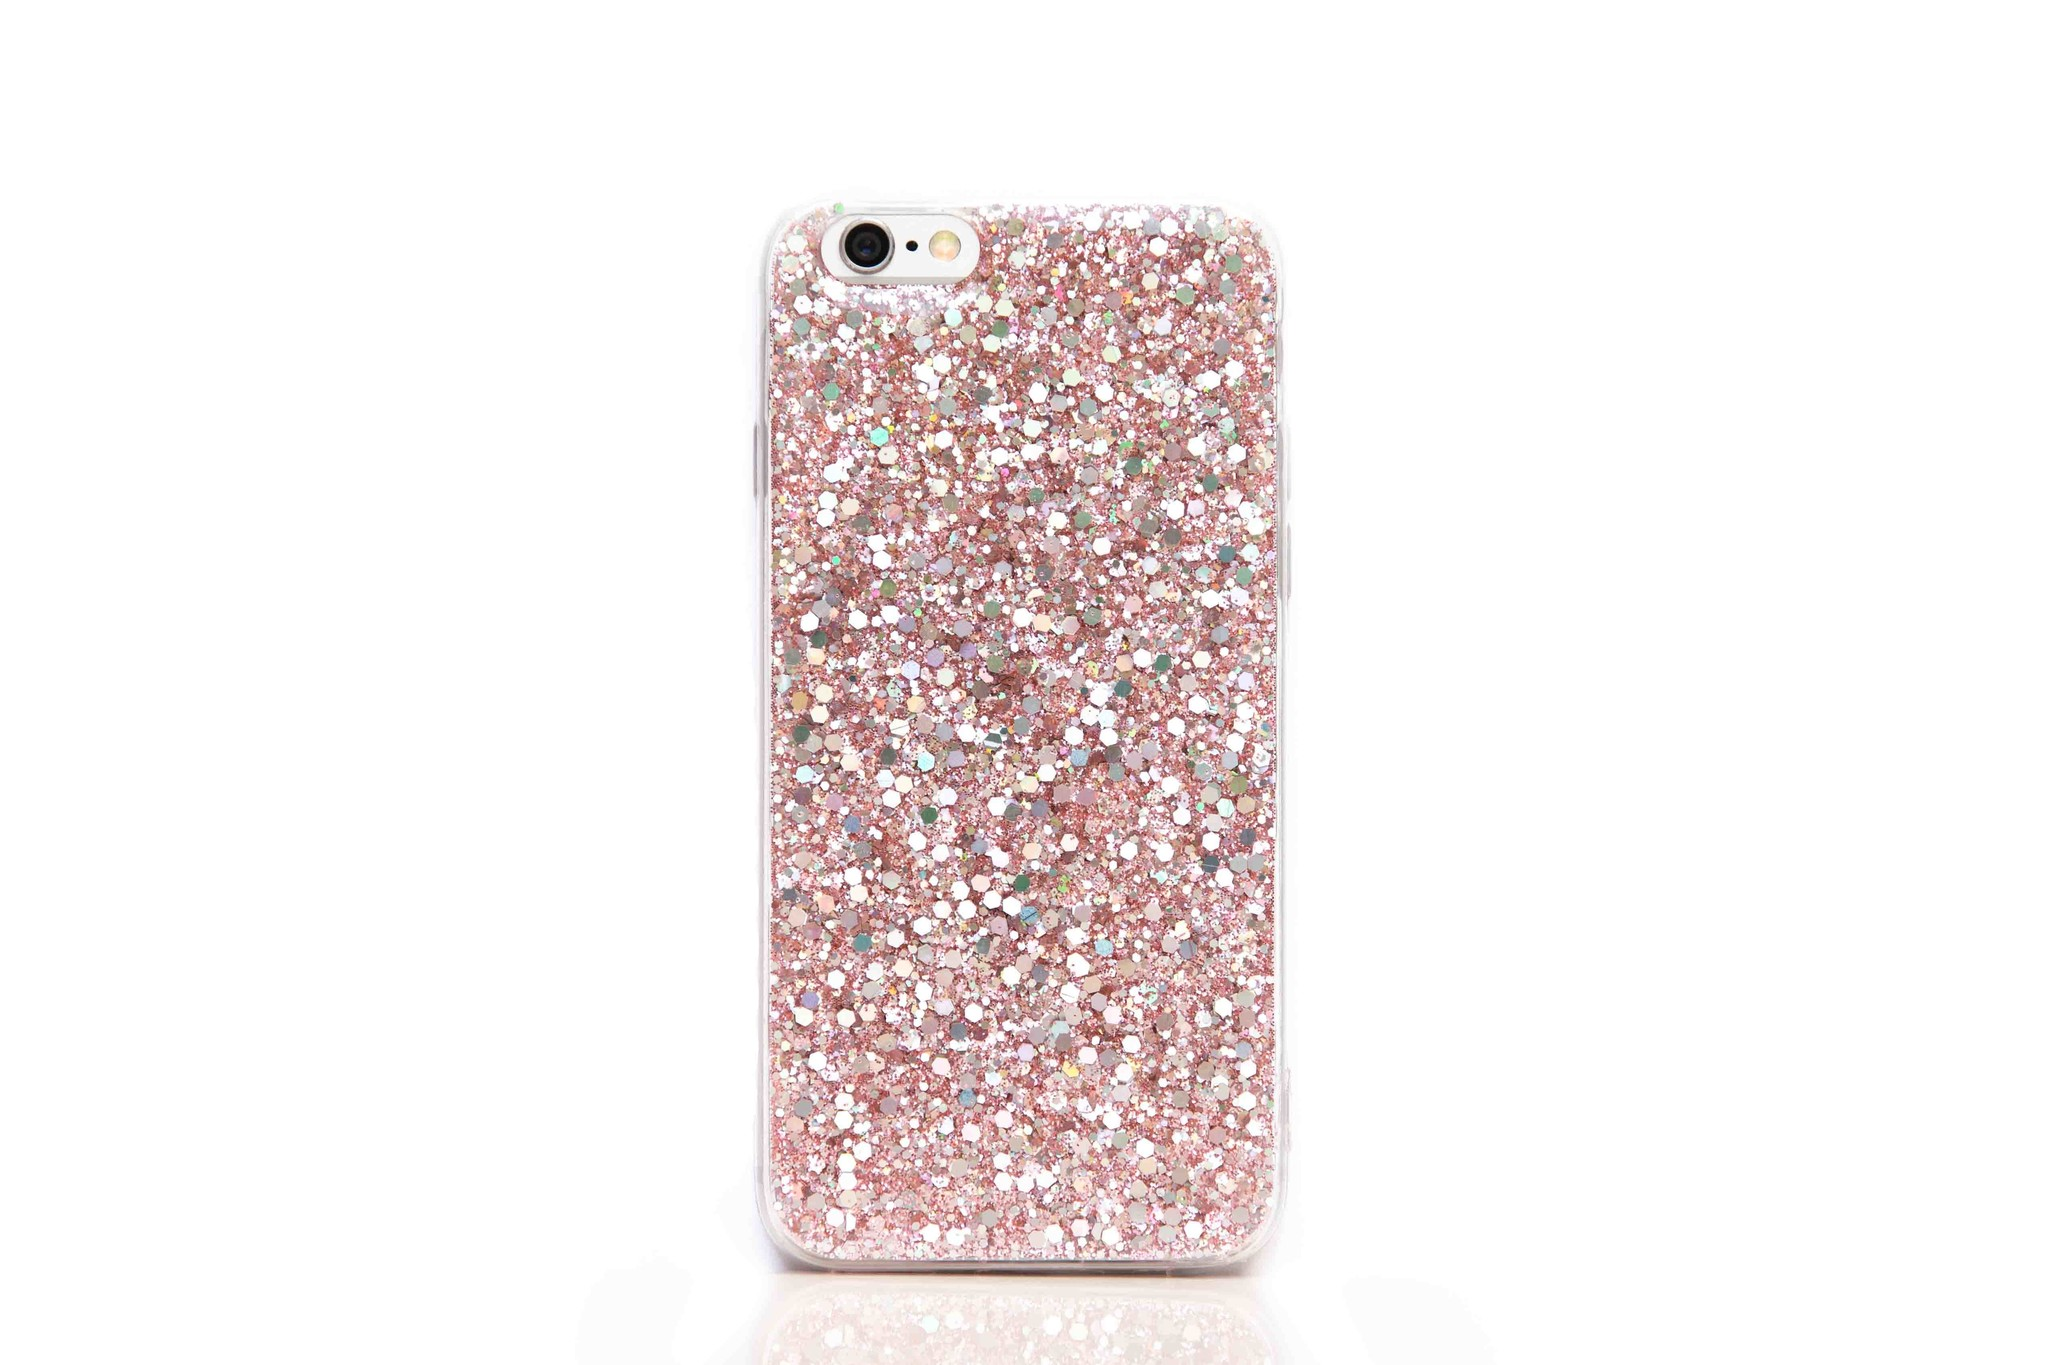 Smartphonehoesje iPhone 12 Pro Max   Bling met roze glitters